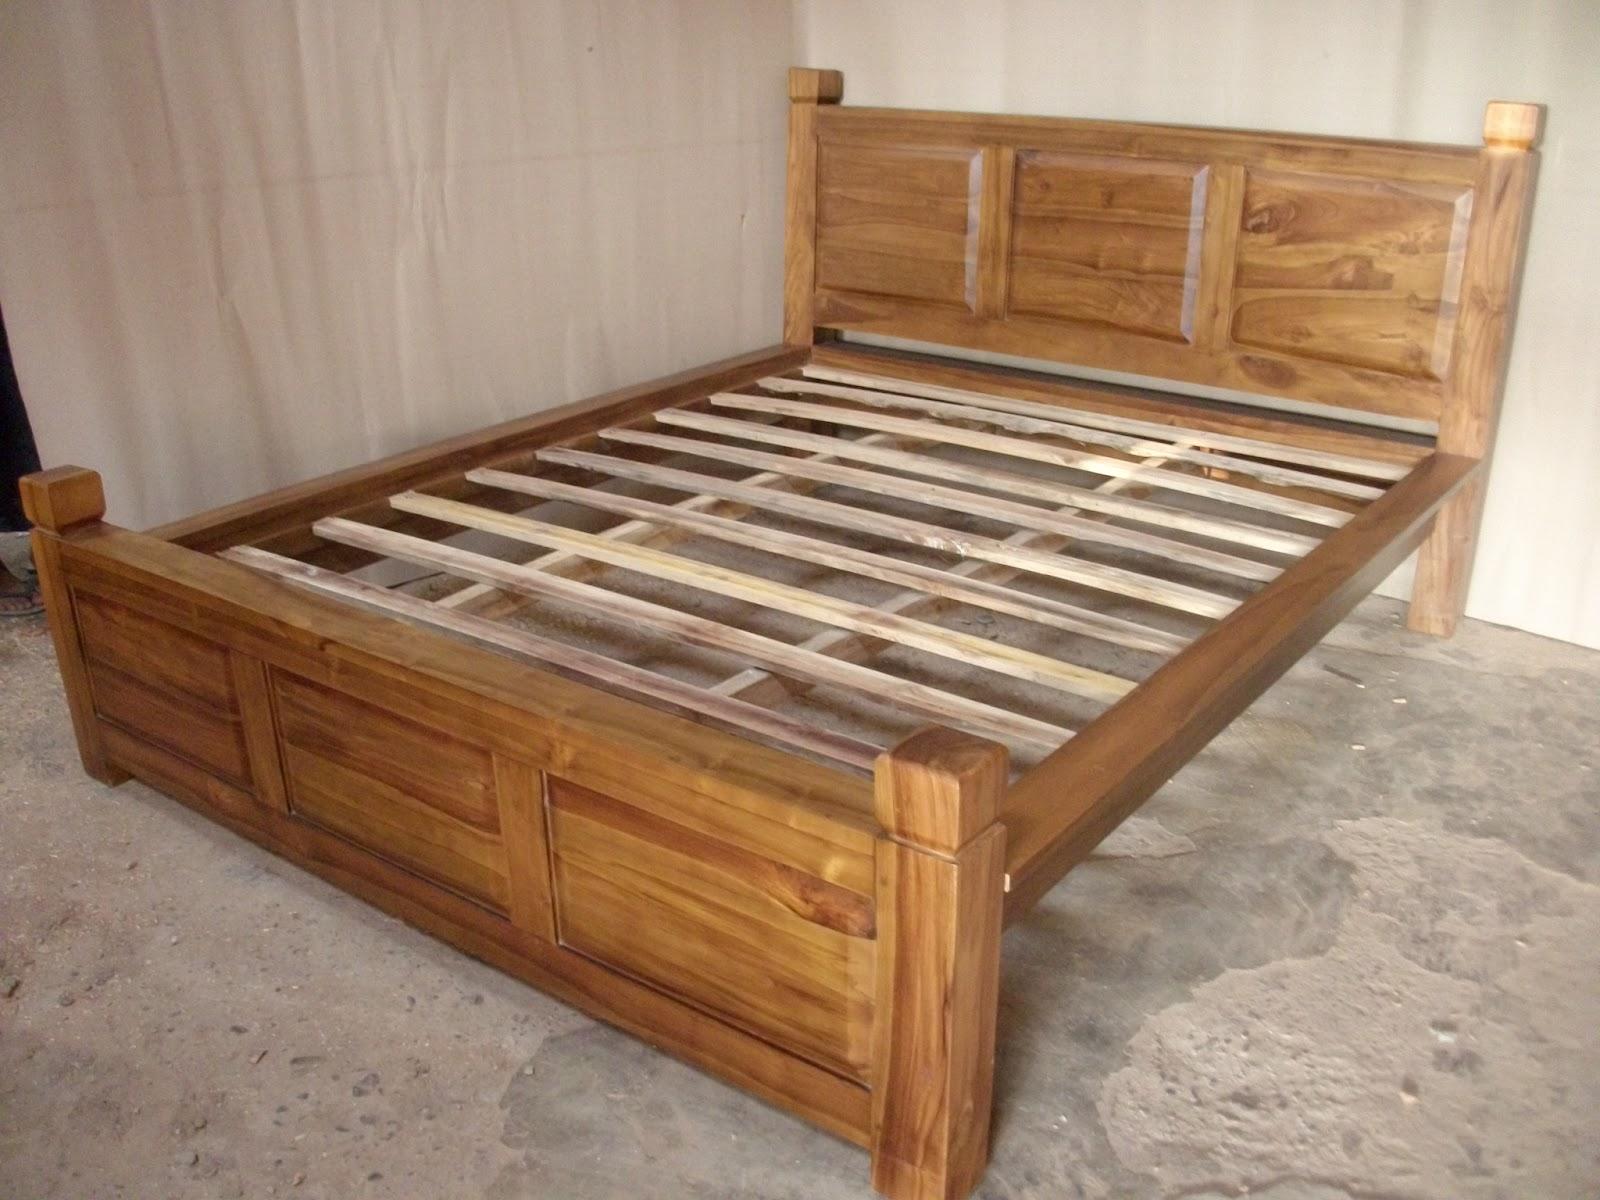 mebel jati jual tempat tidur minimalis jati